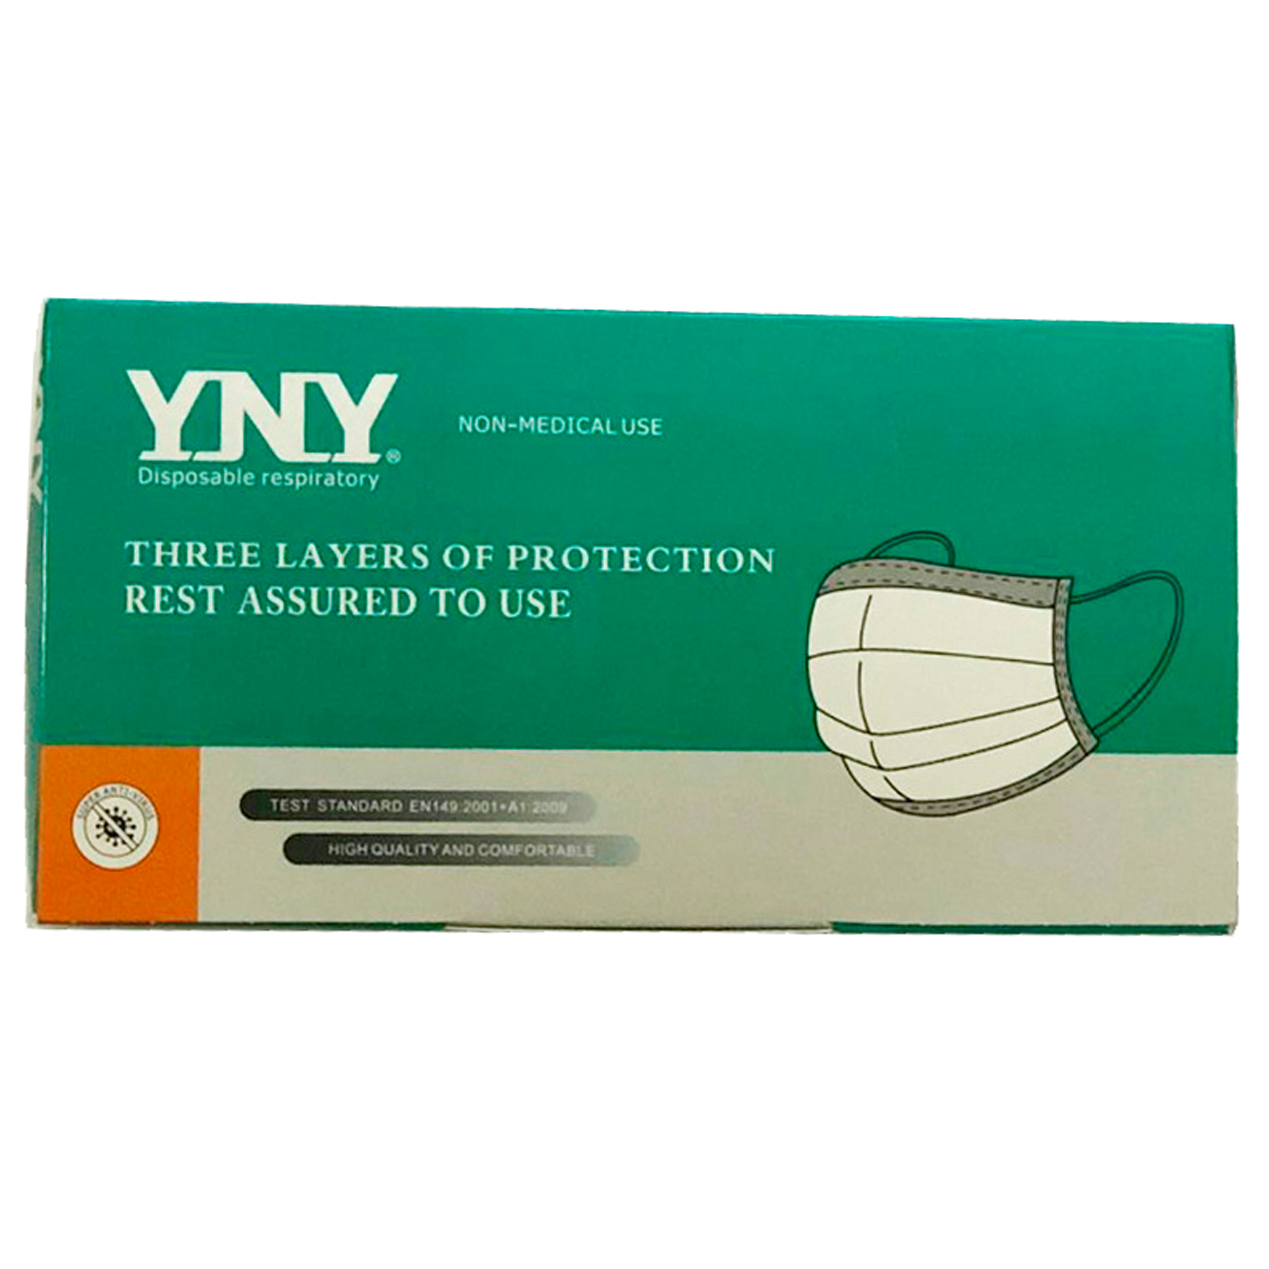 YNY Mask box